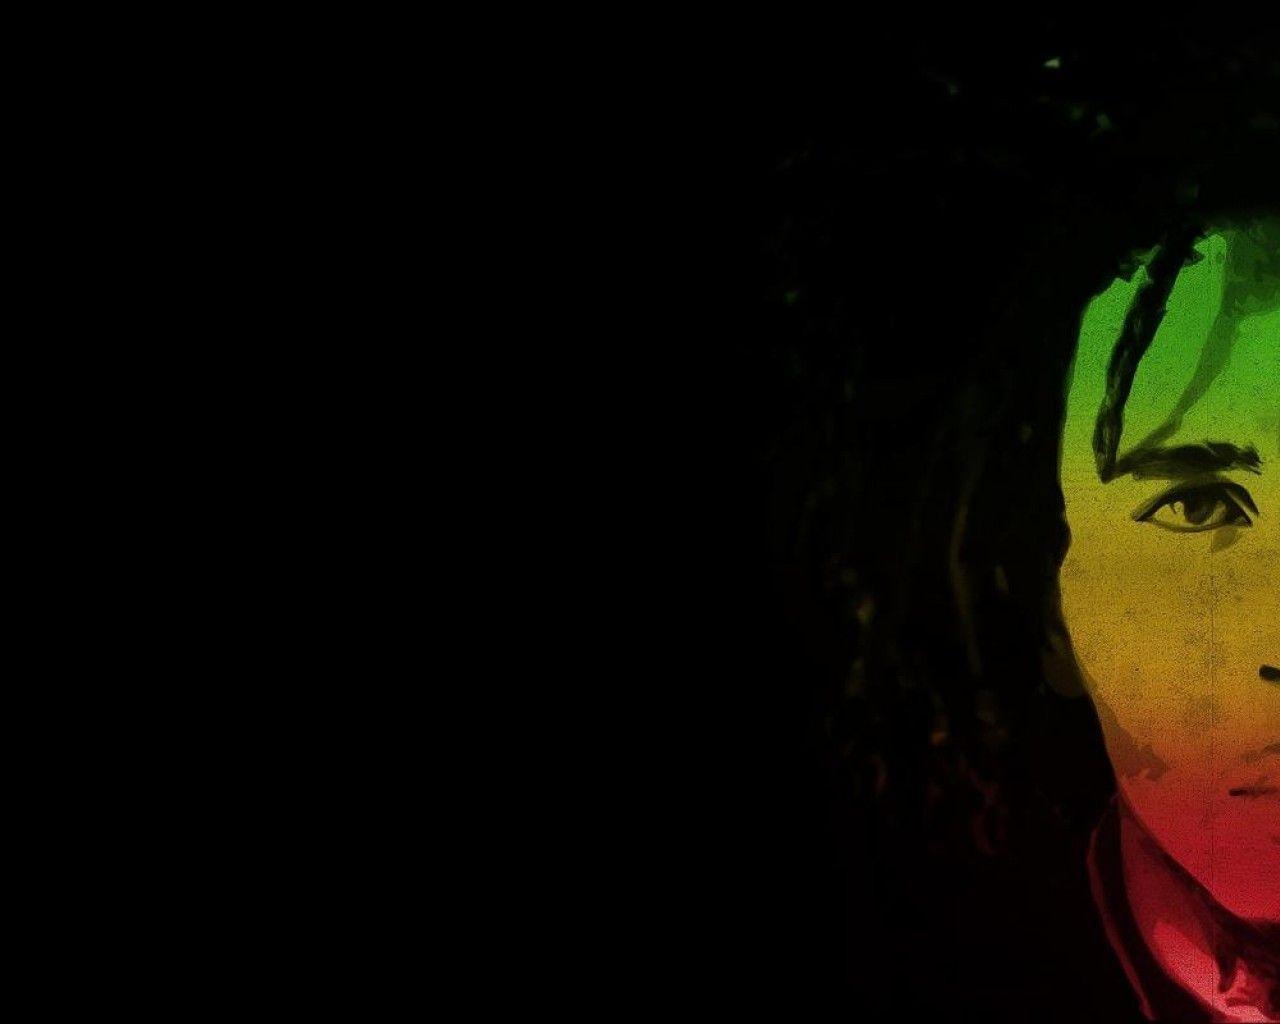 Music Jamaica Bob Marley Rasta Reggae Hd Wallpapers 1280x800PX ...